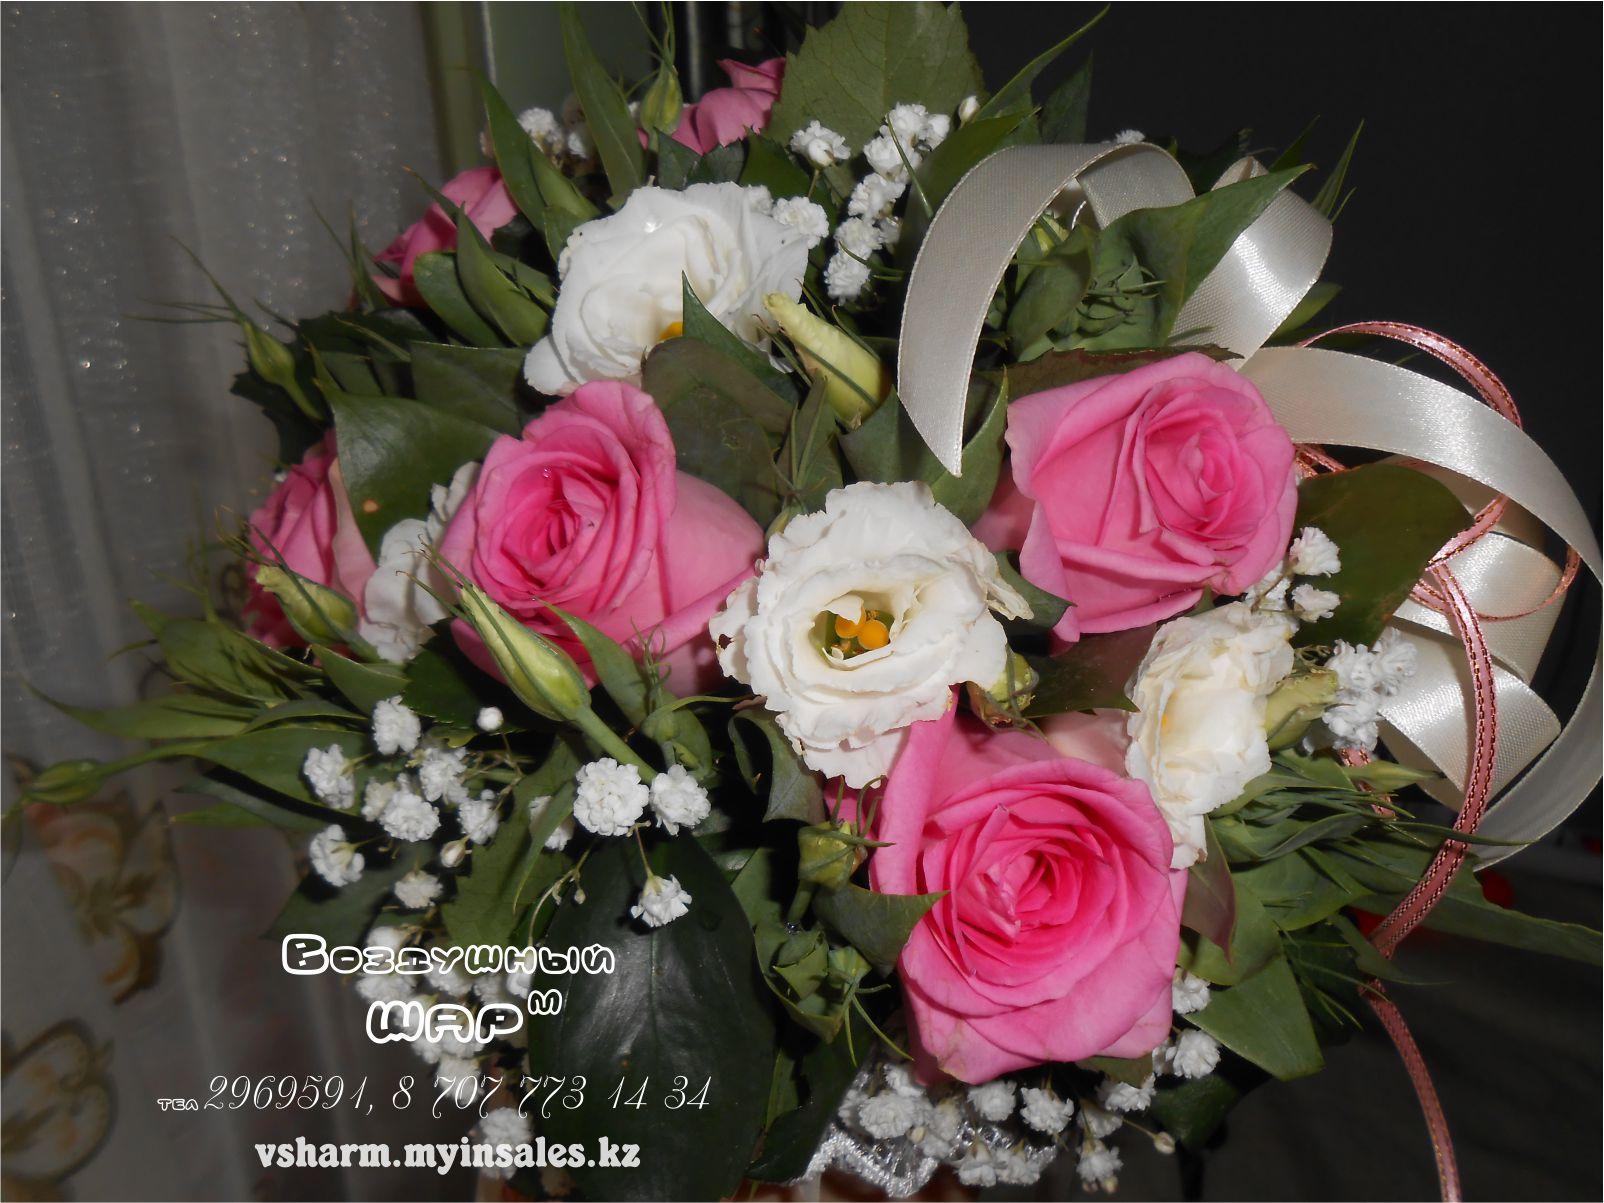 Букет_невесты_Алматы.jpg